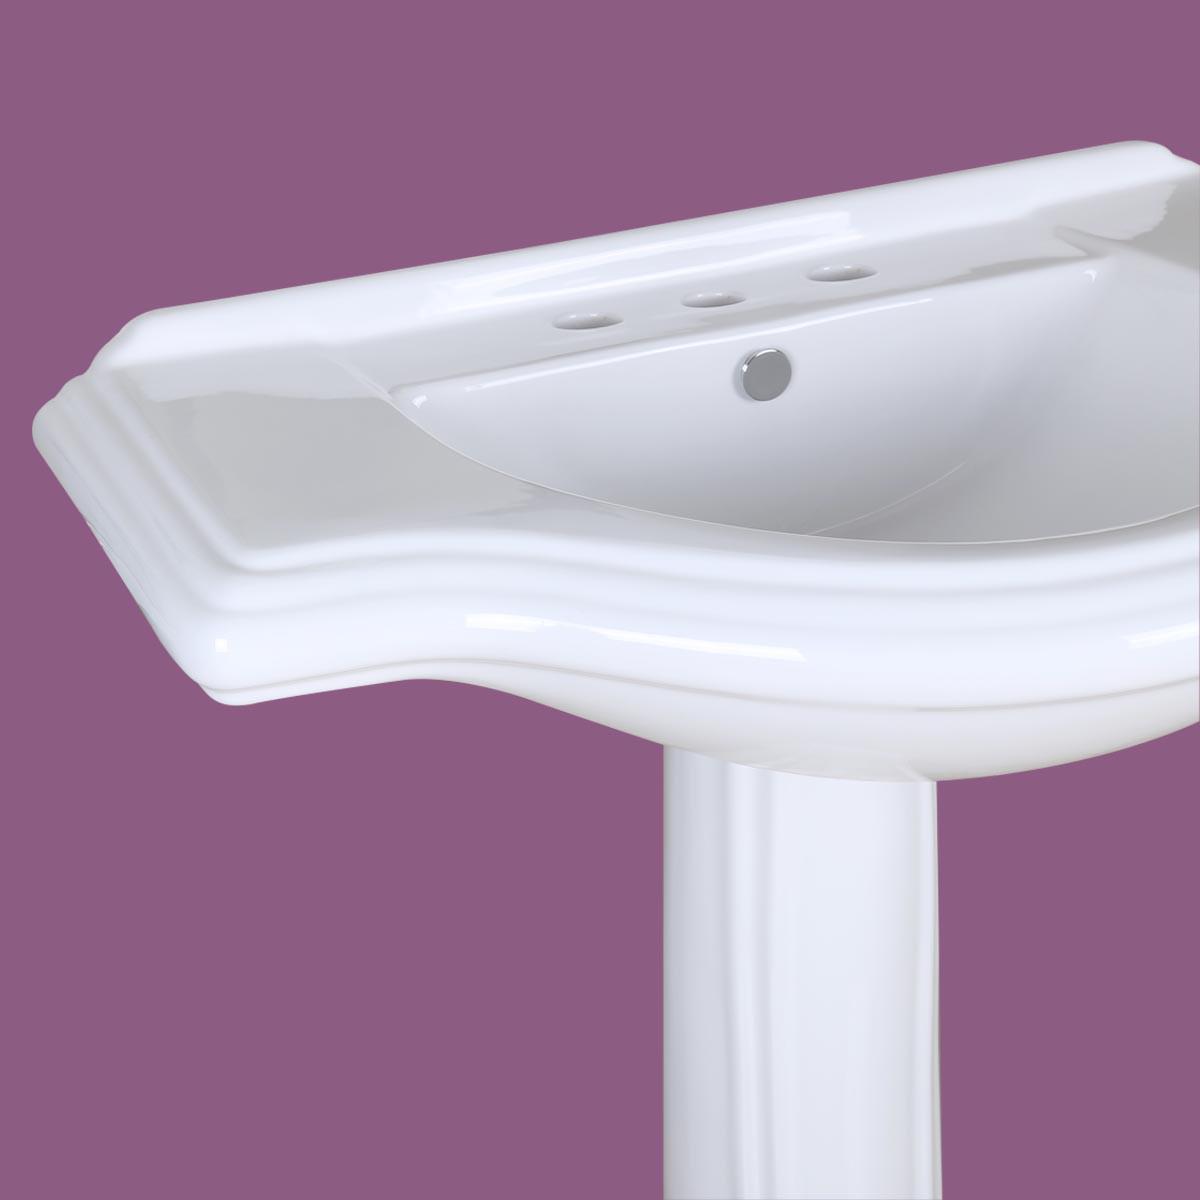 Big Bathroom Sinks Large Pedestal Sink Bathroom Console 8 Quot Widespread 34 Quot W